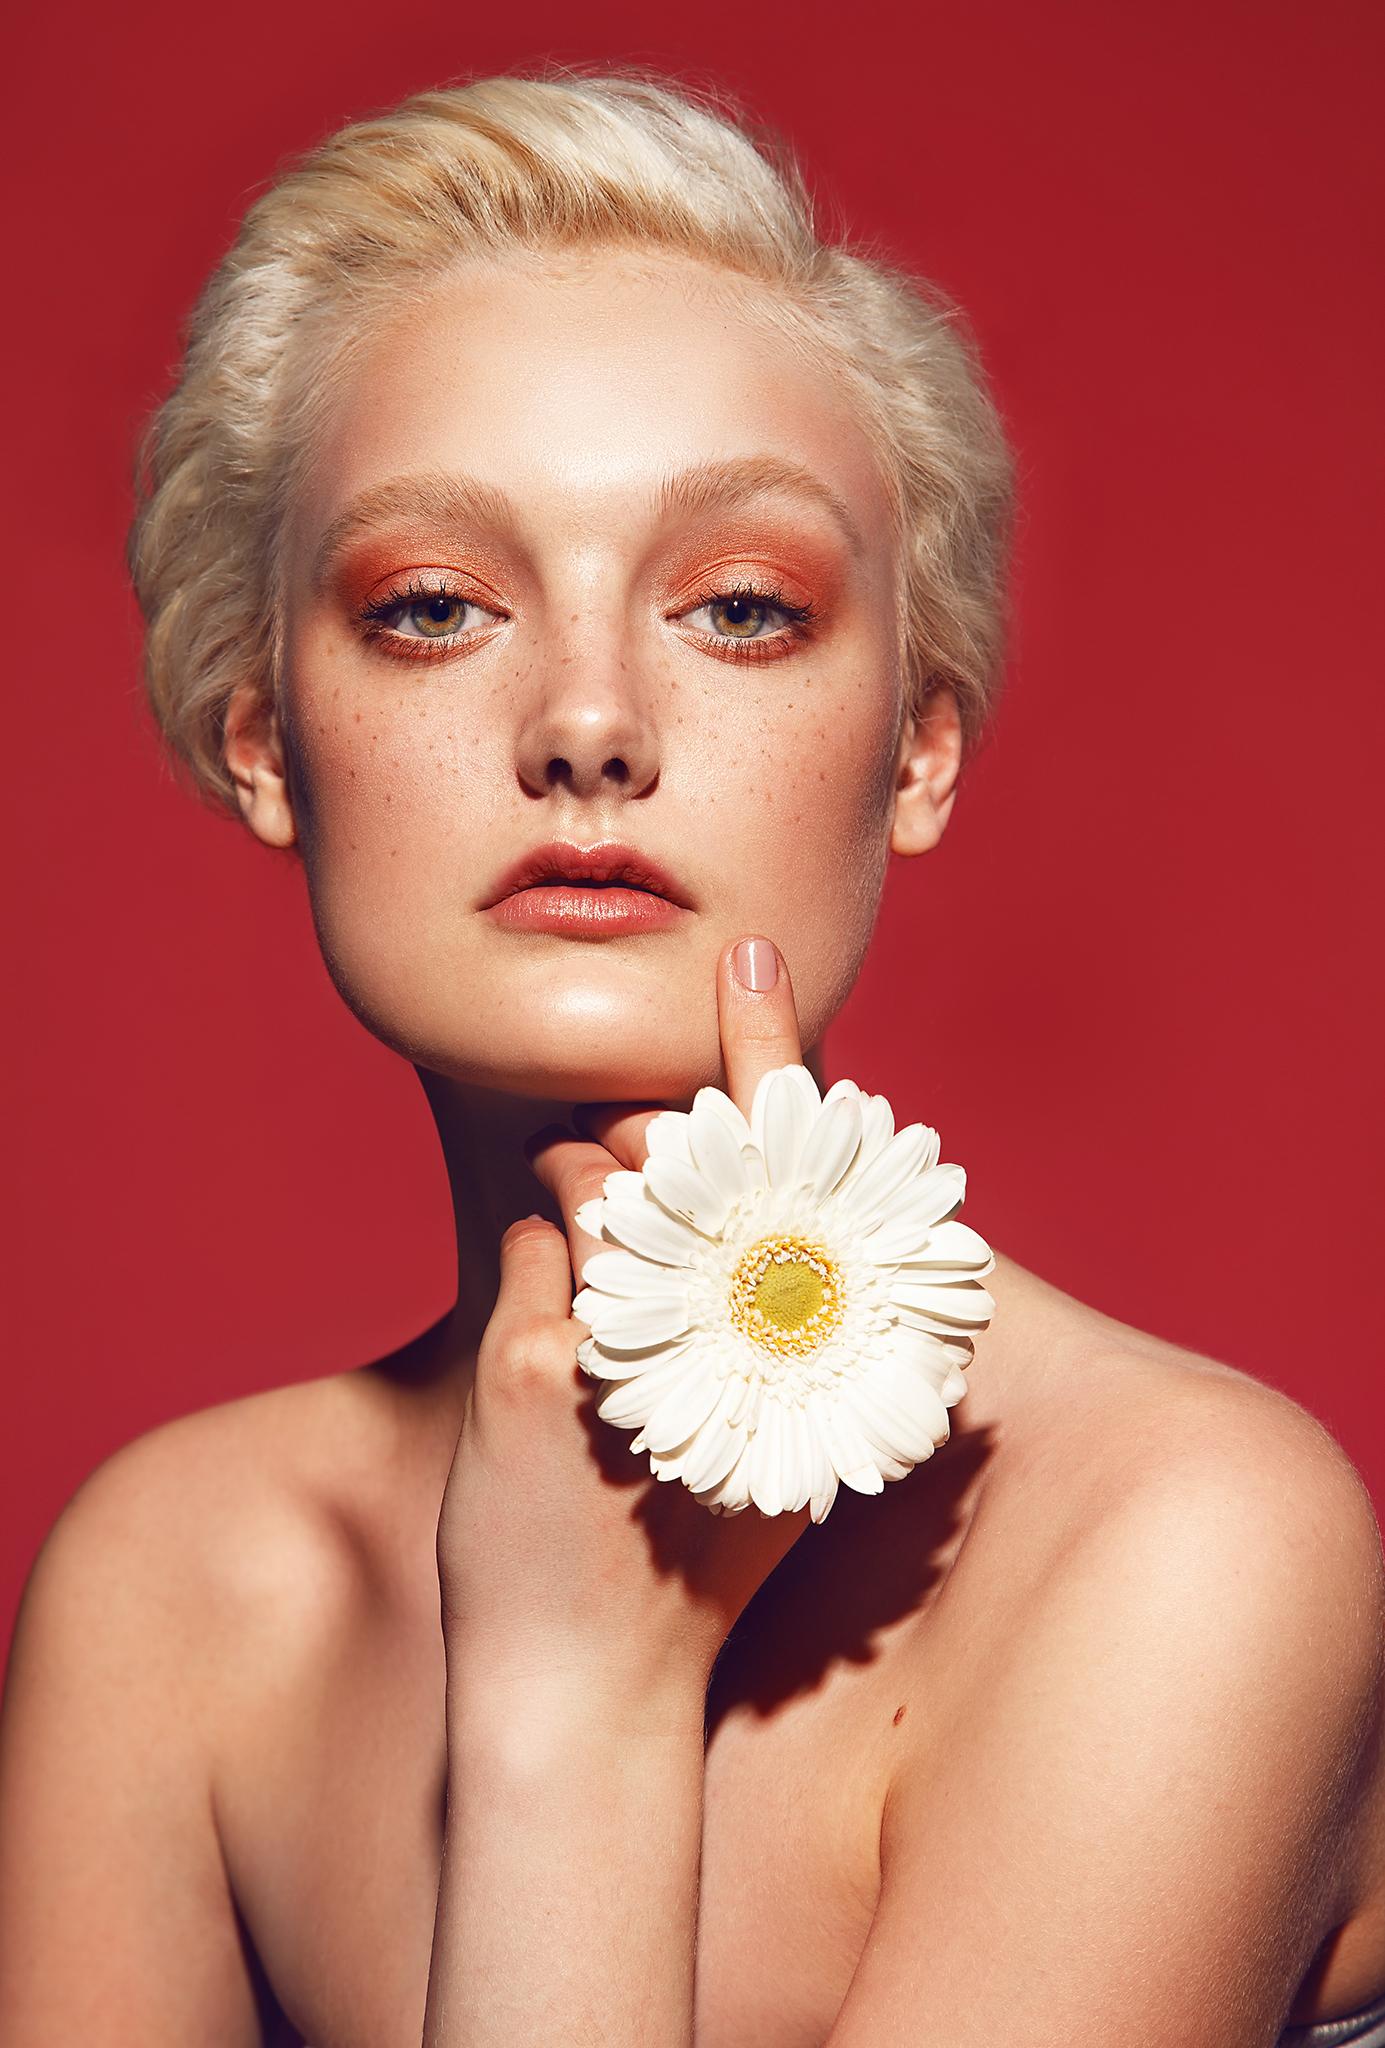 Beauty-Photography-by-beauty-Photographer-Dana-Cole-Red-makeup-fashion-model-heartbreak-models-sunflower-profoto-blonde-model-red-lips-beauty-photo-colorful-makeup-skin.jpg